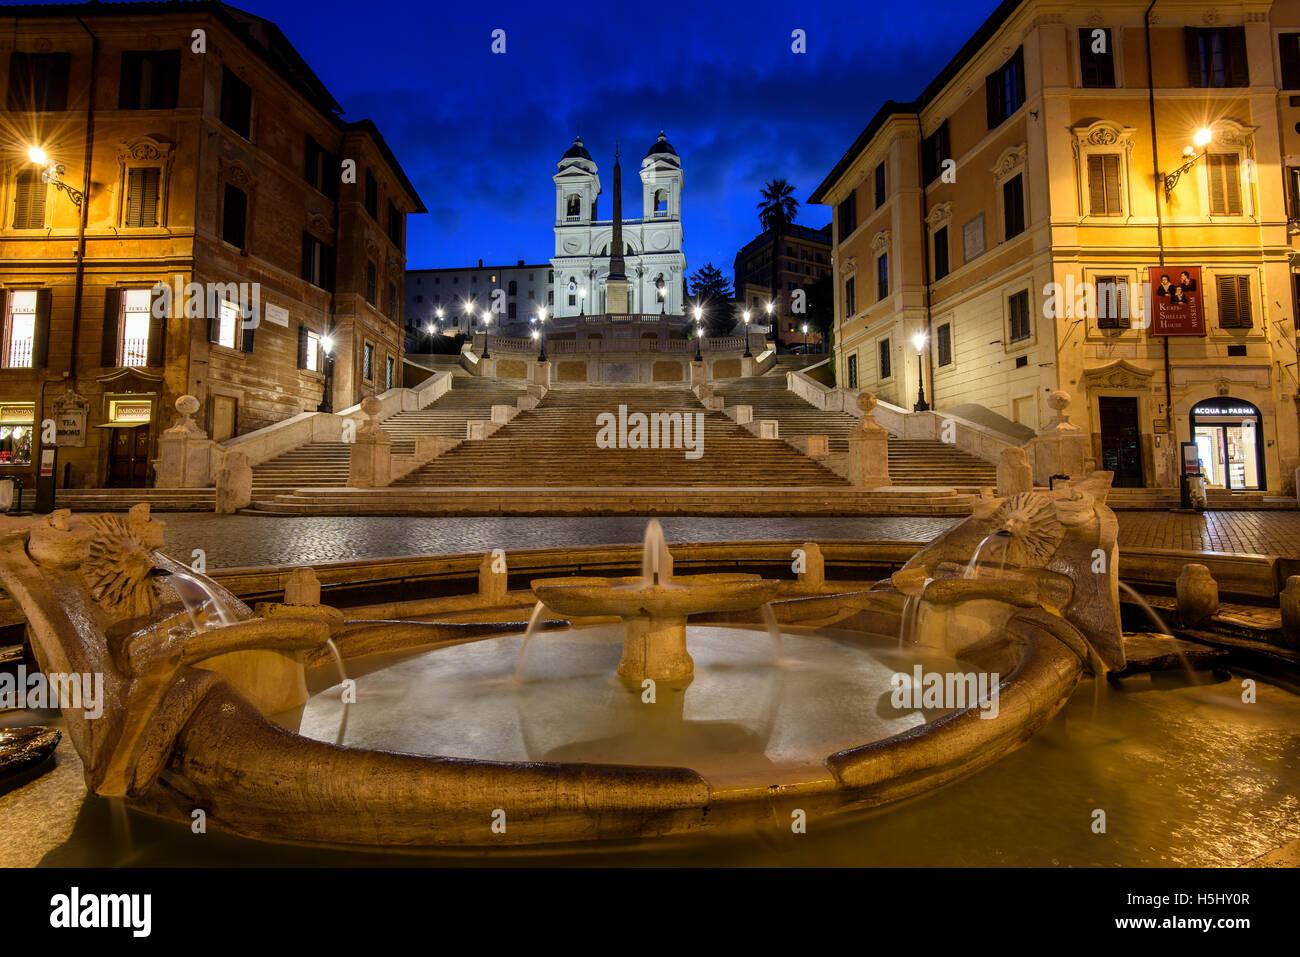 Nachtansicht der Fontana della Barcaccia und spanische Treppe, Piazza di Spagna, Rom, Latium, Italien Stockbild